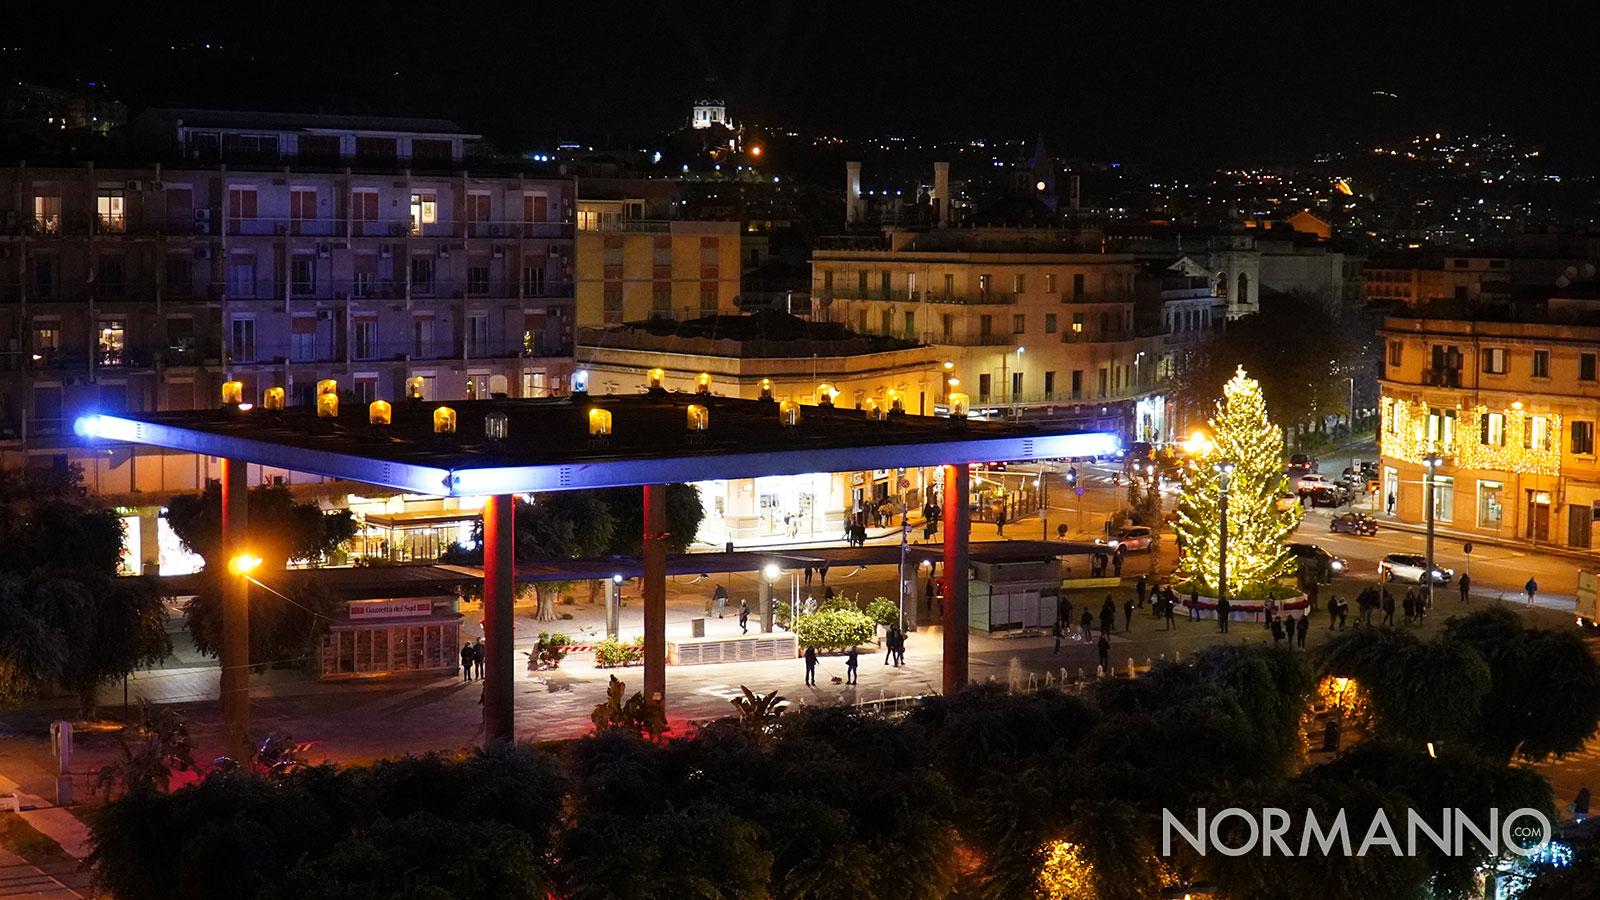 natale a messina 2020: albero e griglia illuminata a piazza cairoli